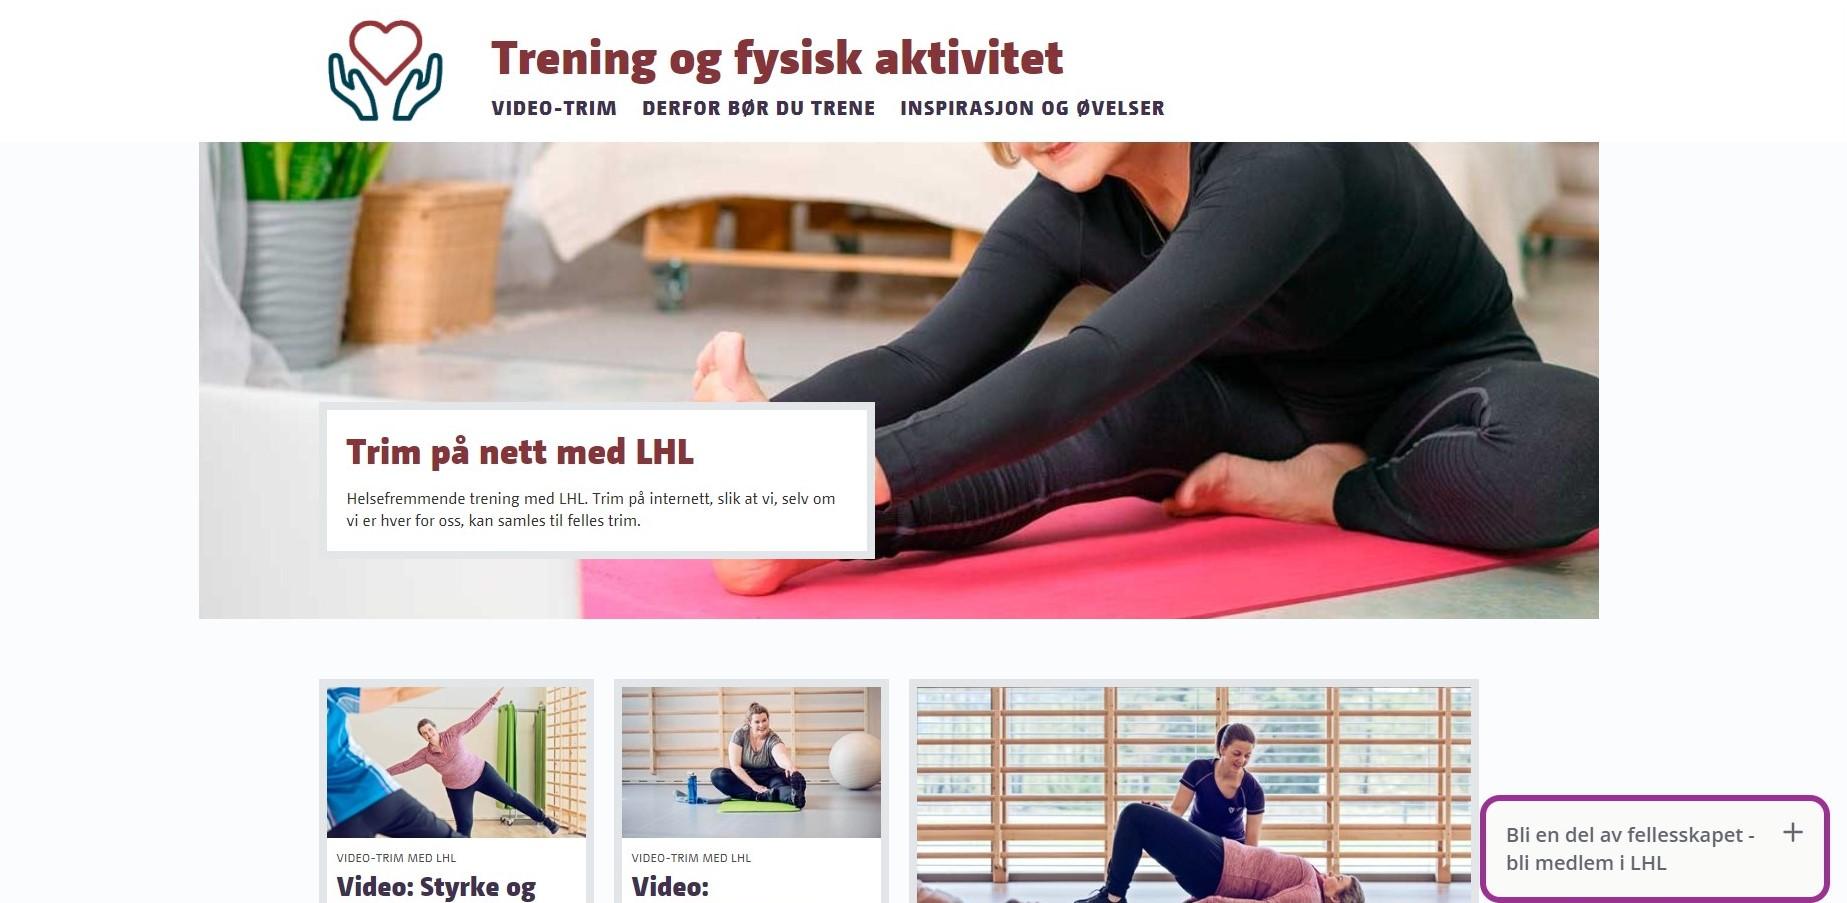 https://www.lhl.no/et-sunnere-liv/fysisk-aktivitet/video-trim/